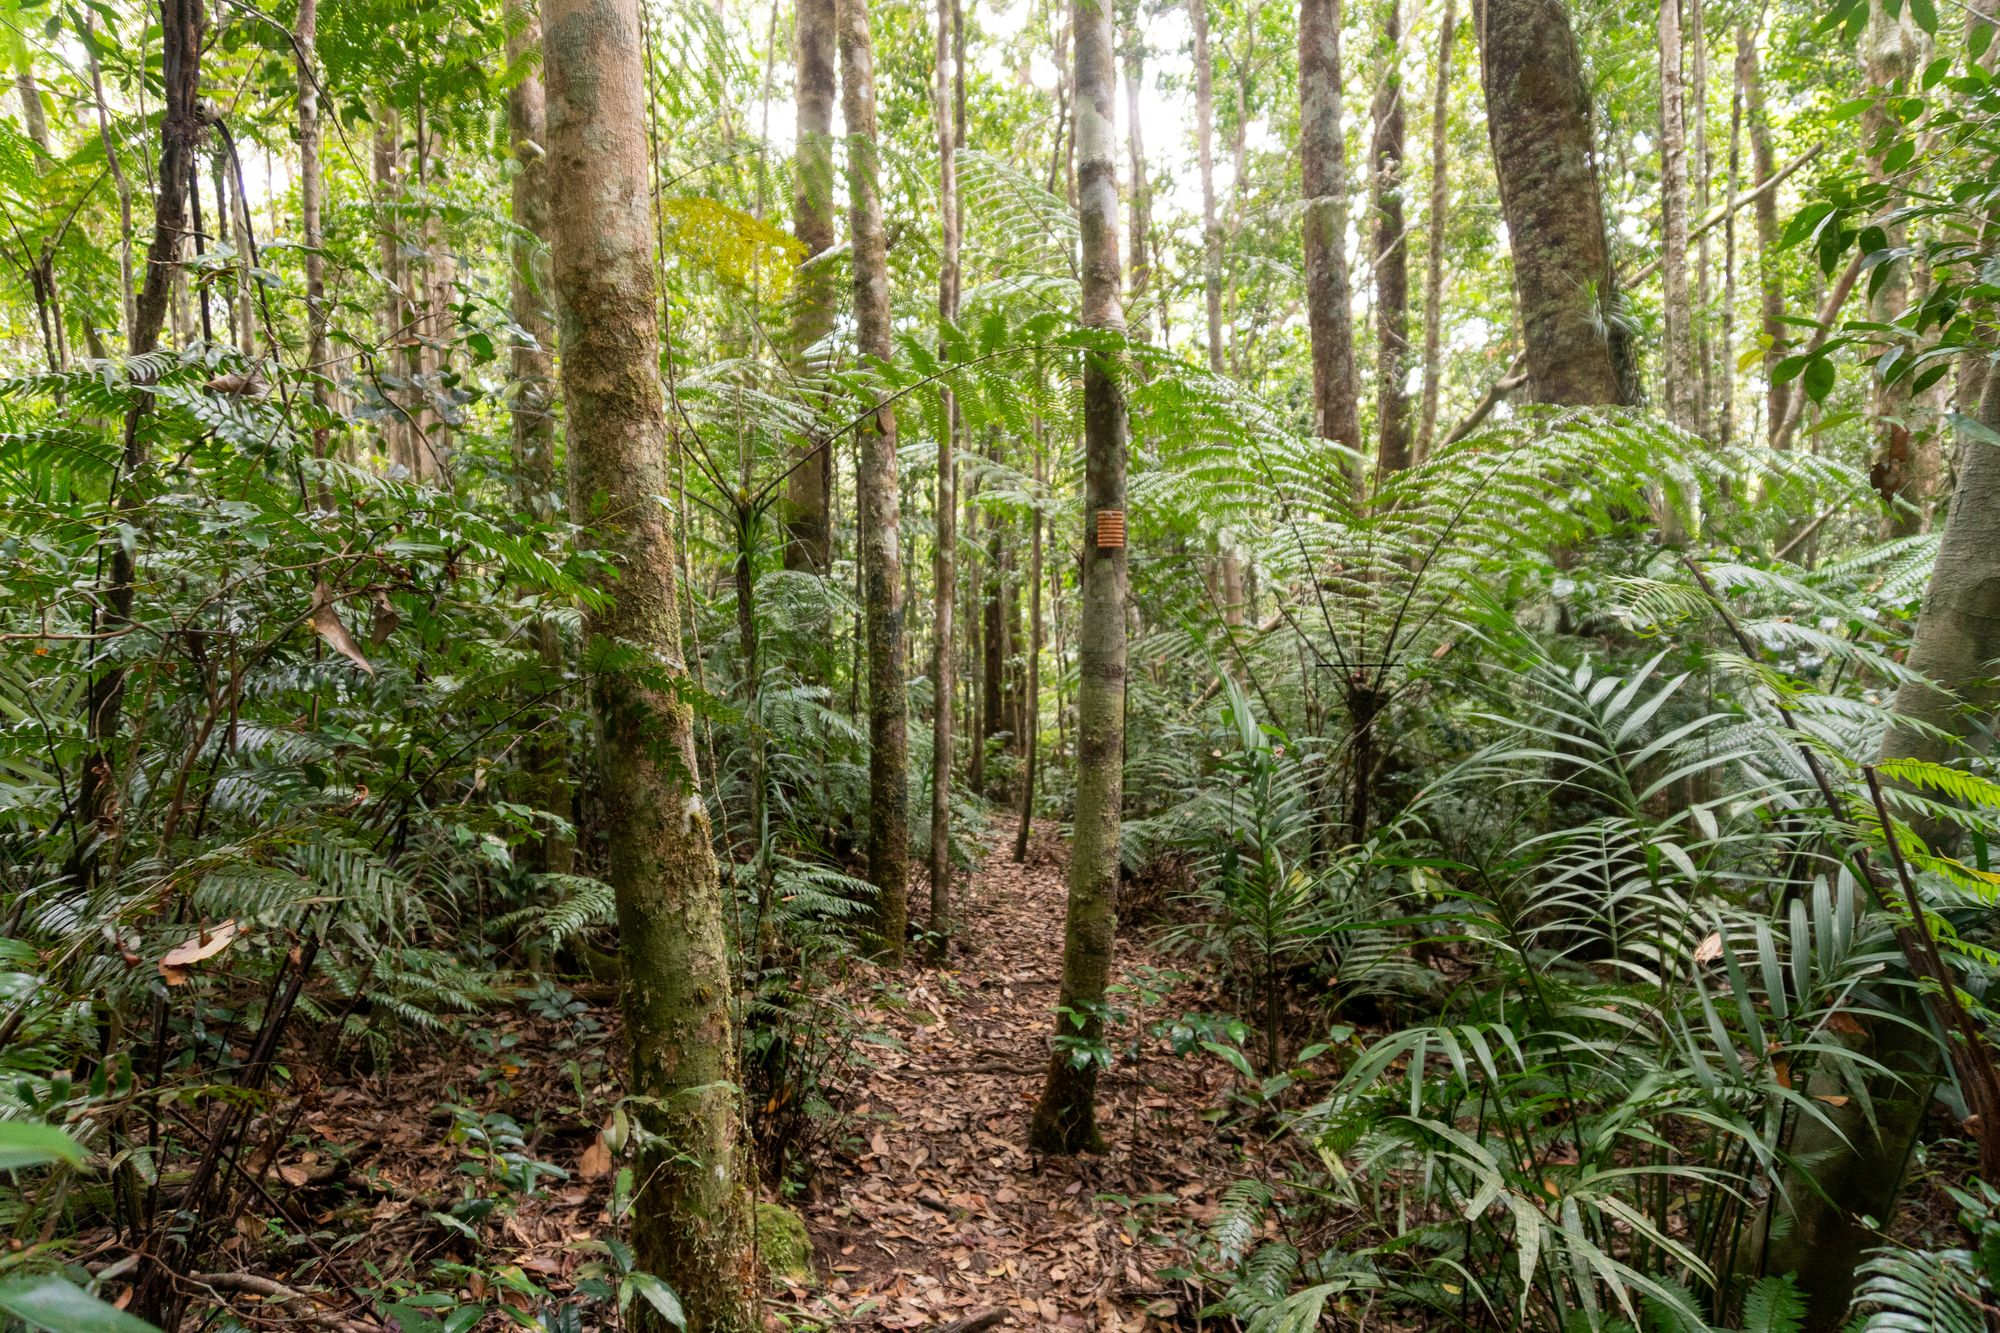 Paluma Range National Park trails